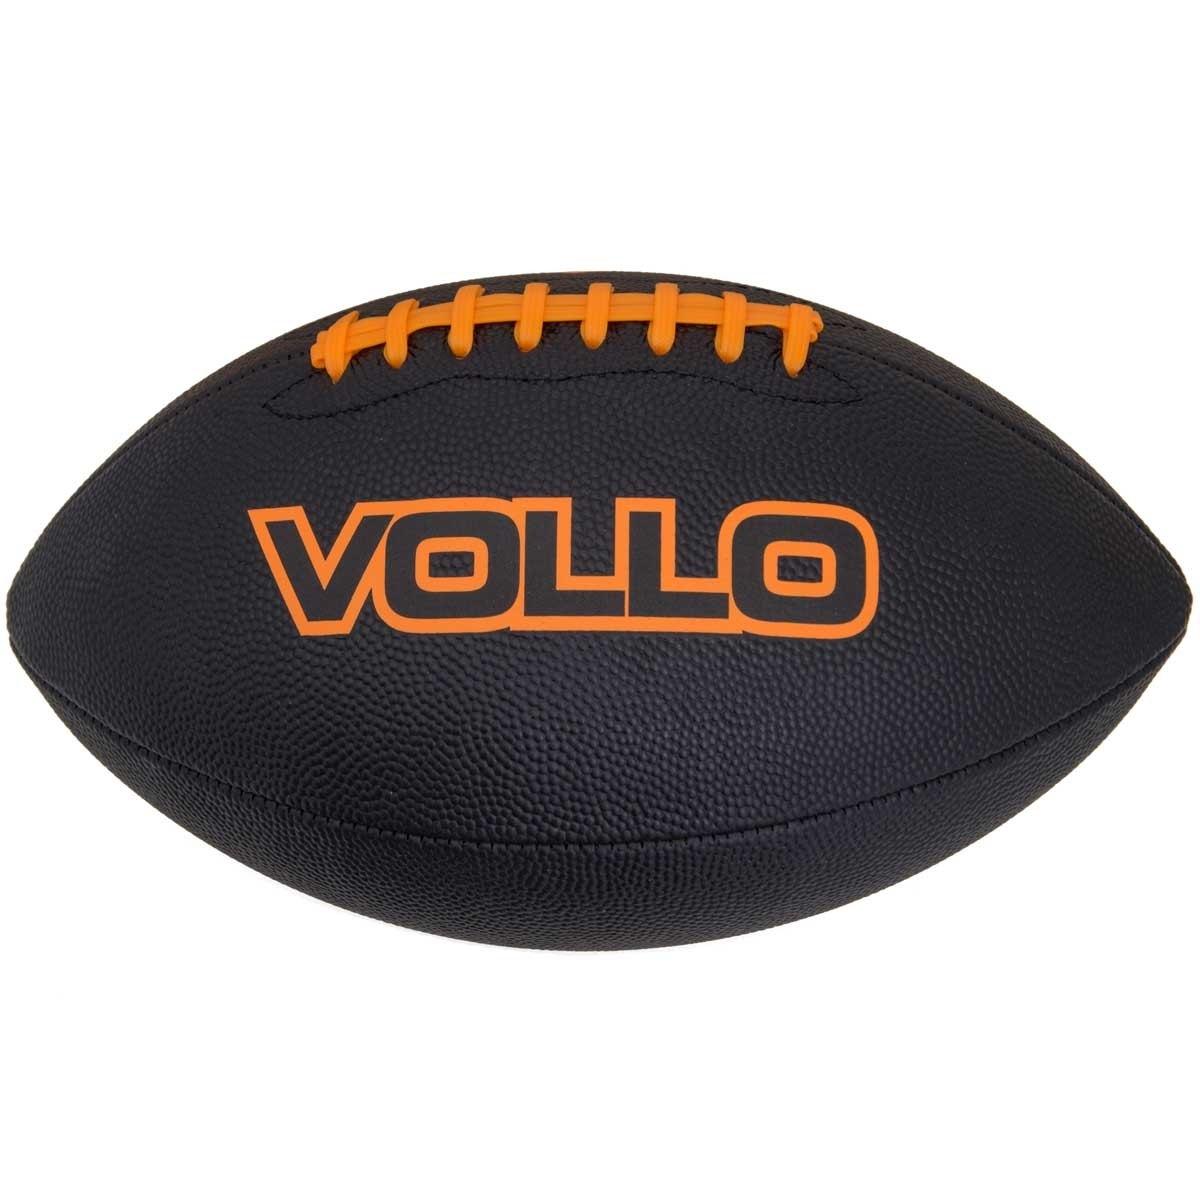 Bola de Futebol Americano Preta Tamanho Oficial Vollo